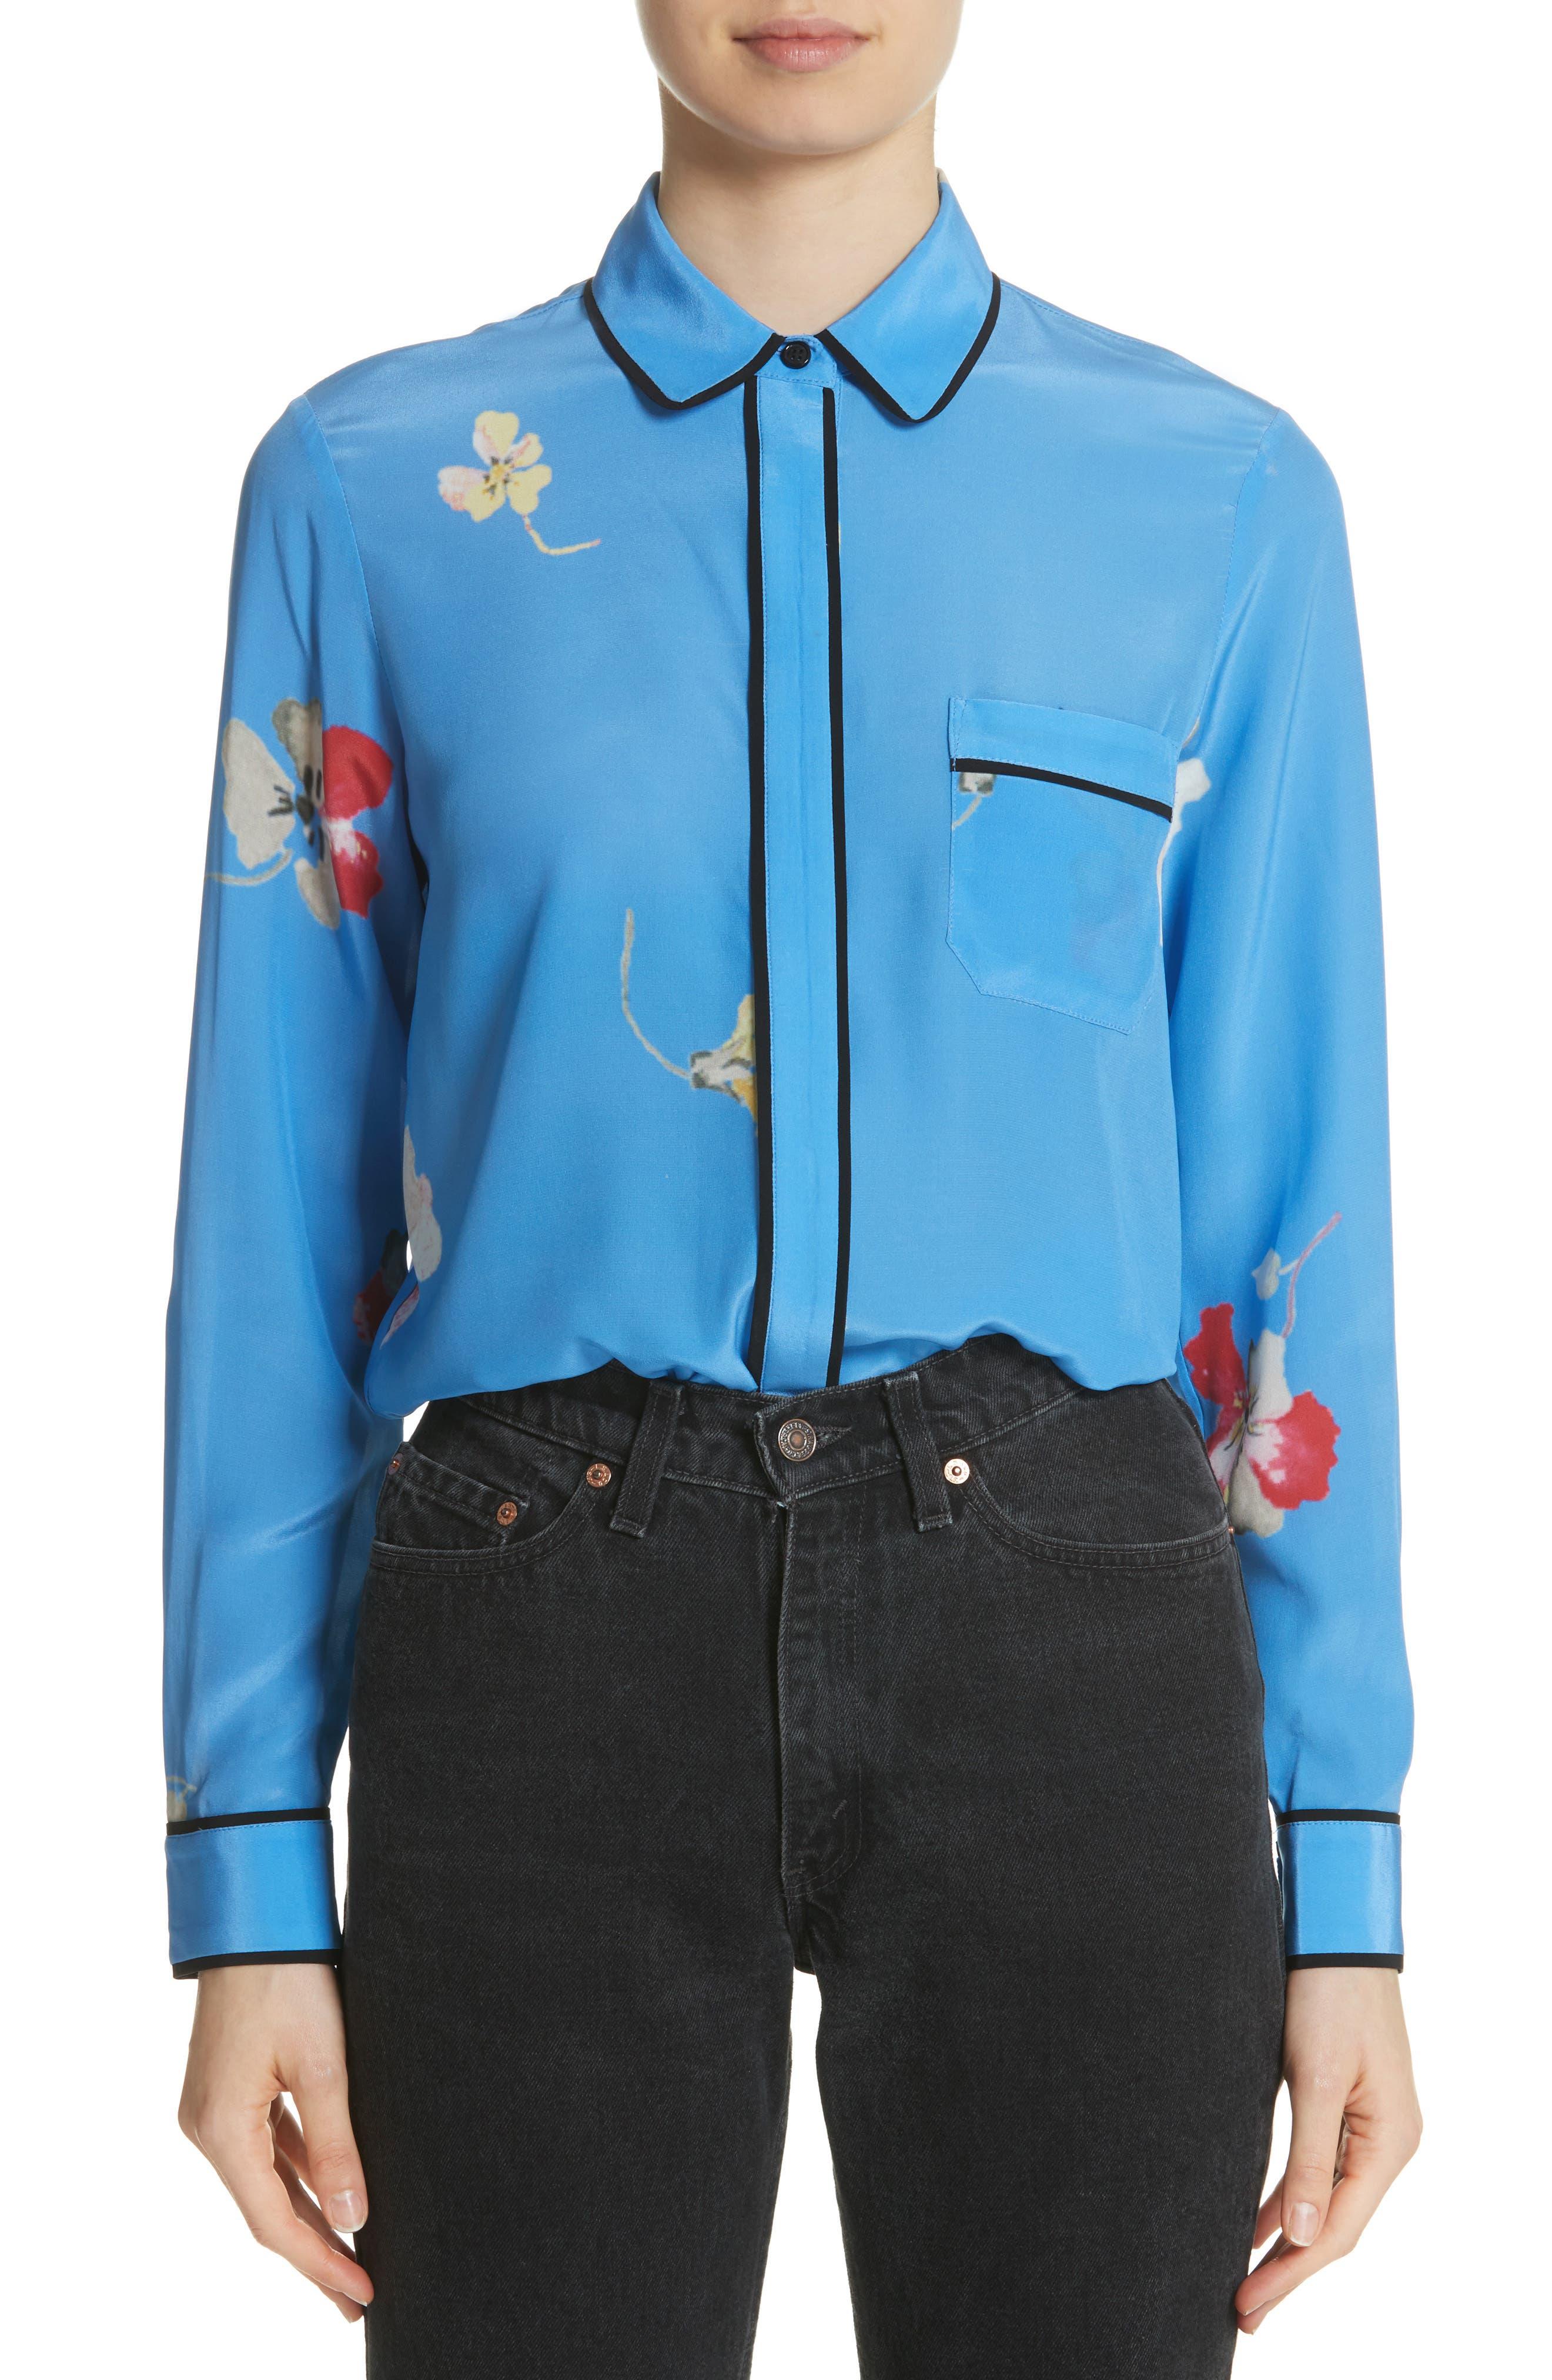 Joycedale Floral Silk Shirt,                             Main thumbnail 1, color,                             Marina